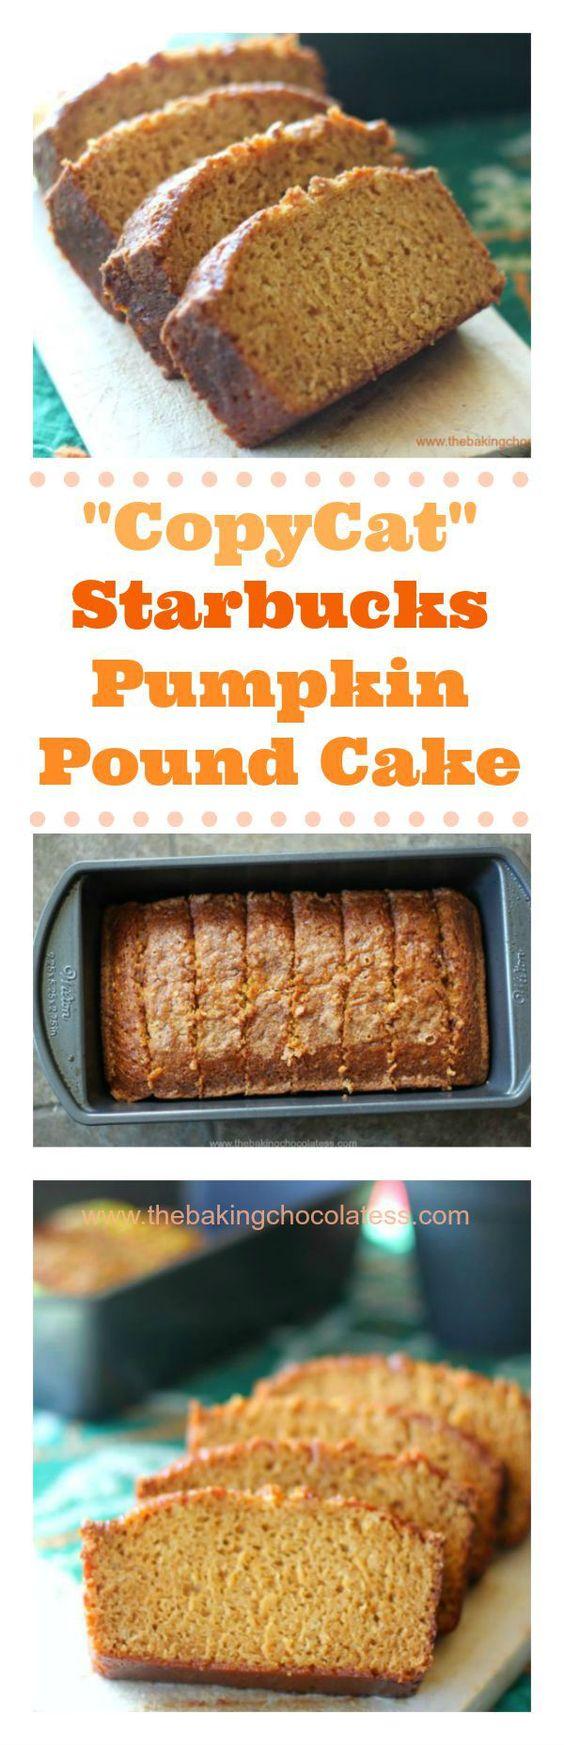 """CopyCat"" Starbucks Pumpkin Pound Cake"